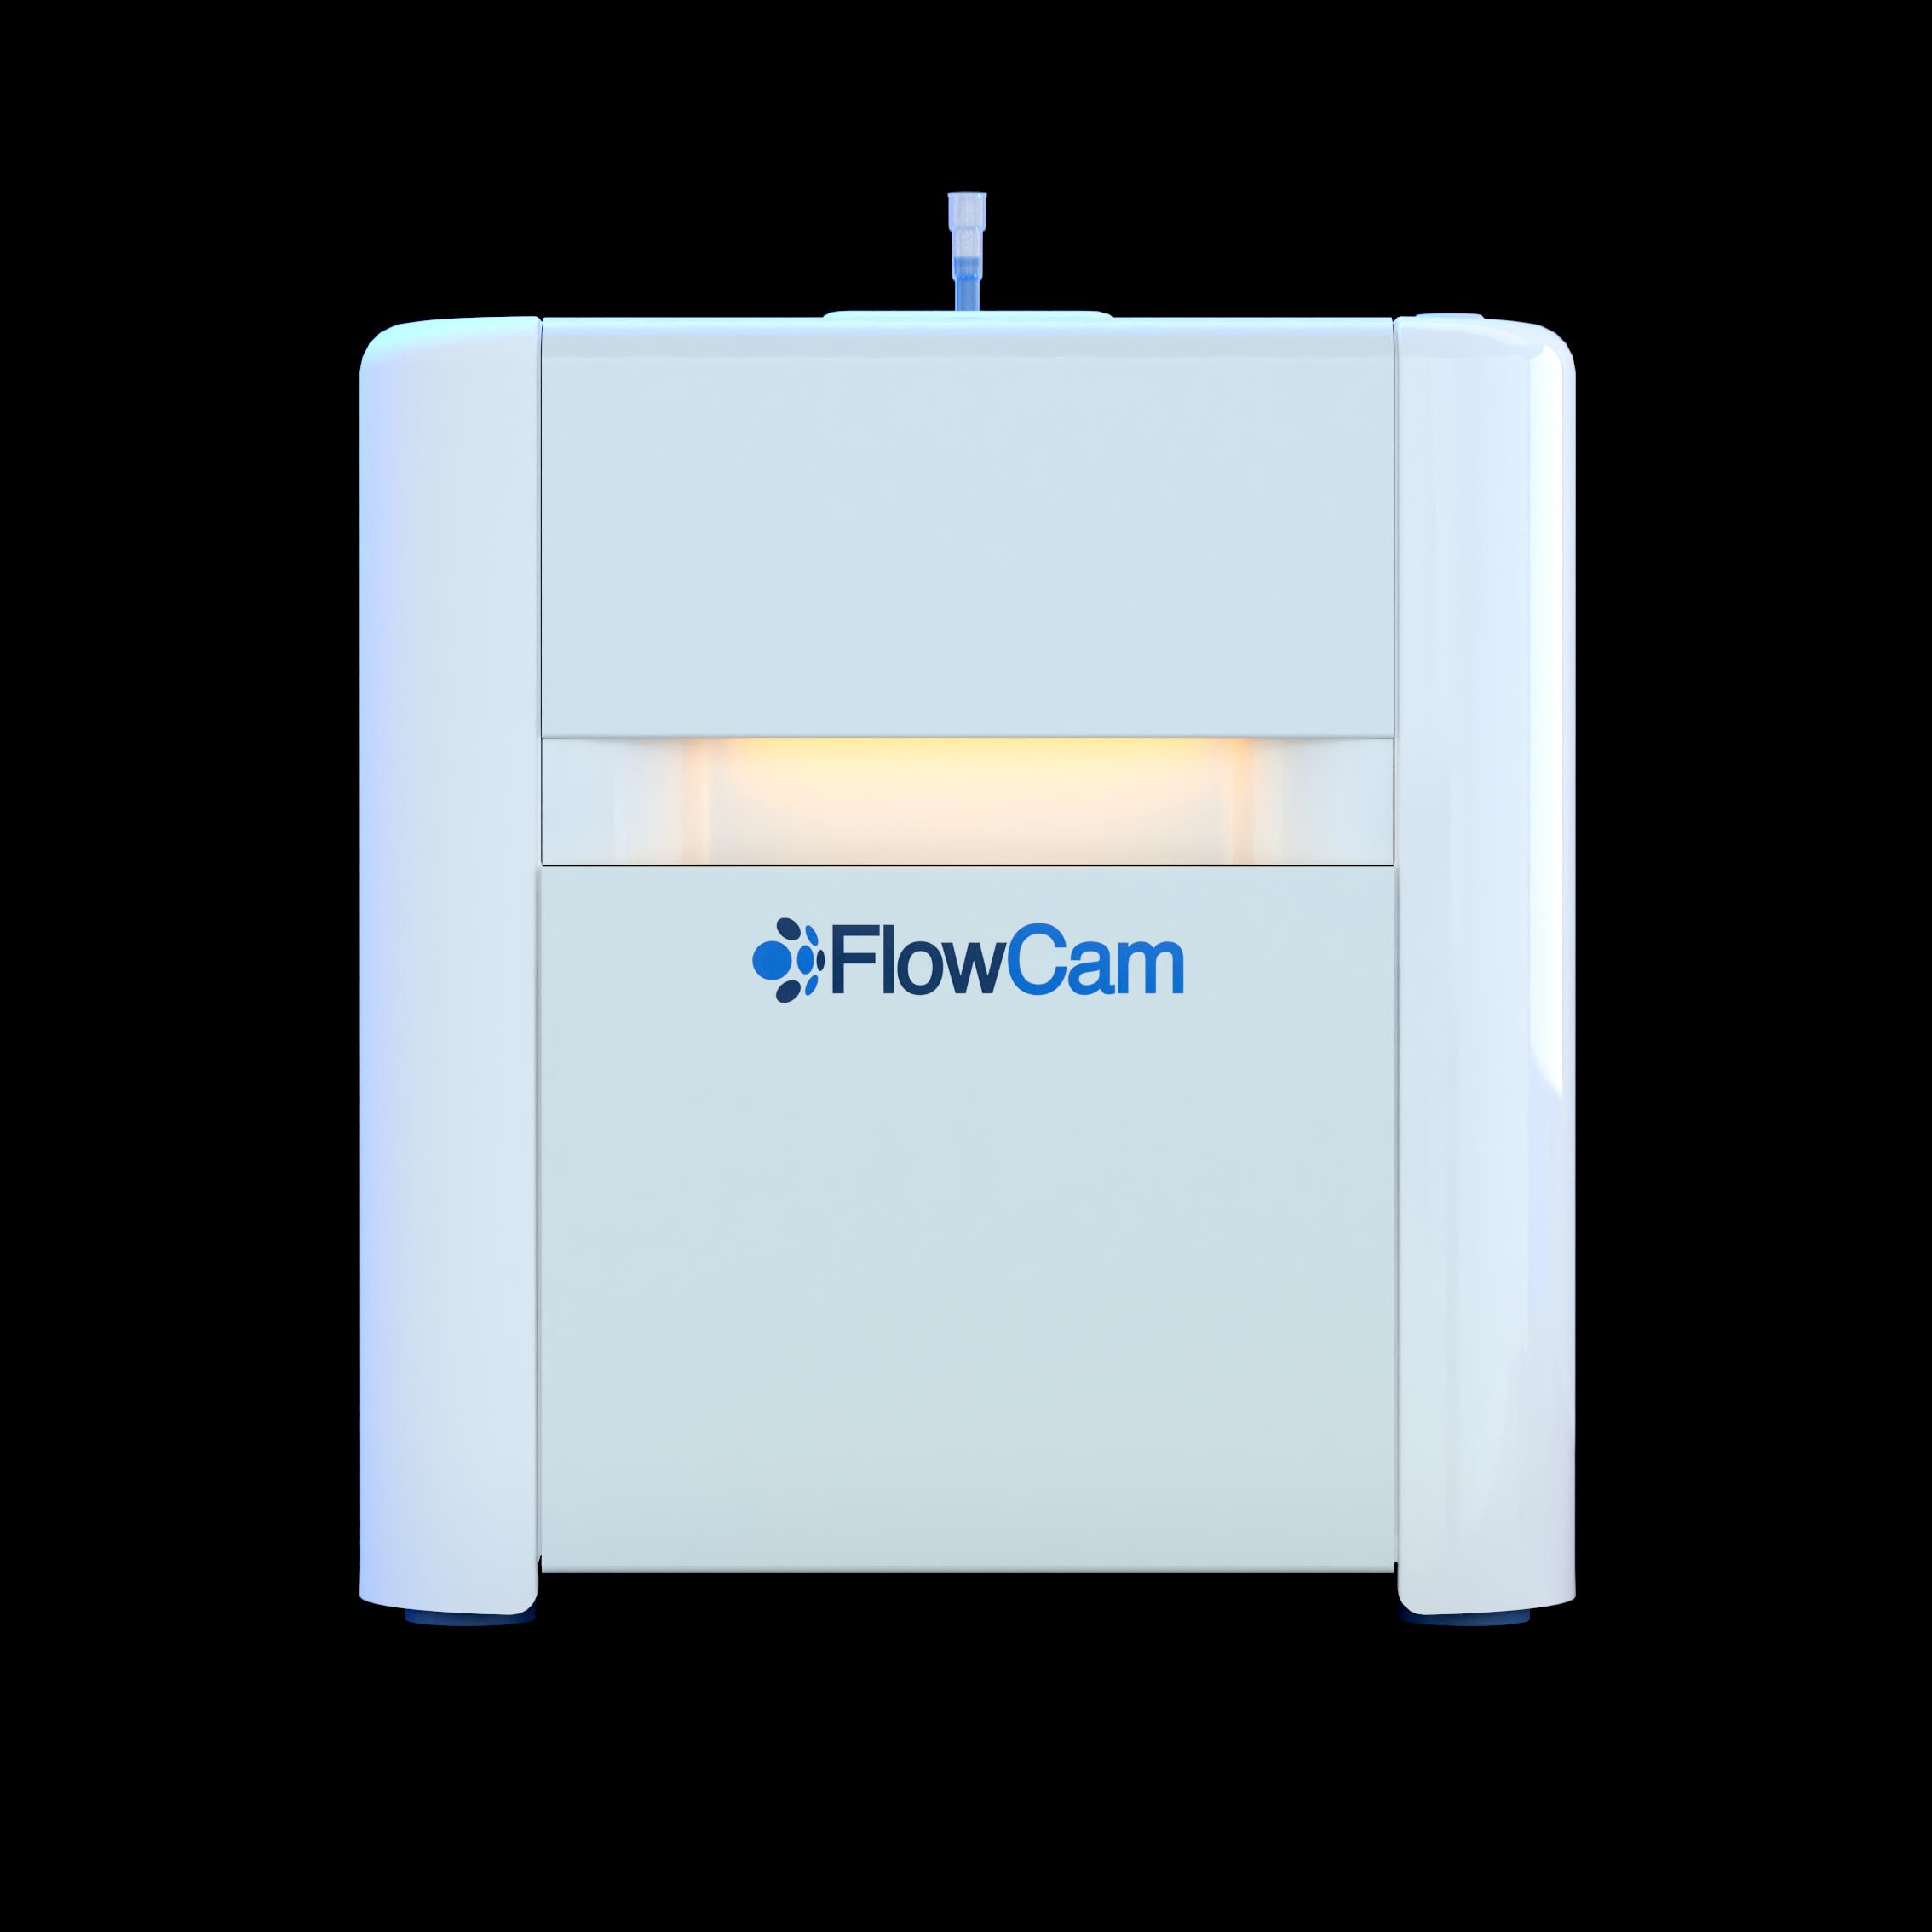 FlowCam フローイメージング顕微鏡 thumbnail